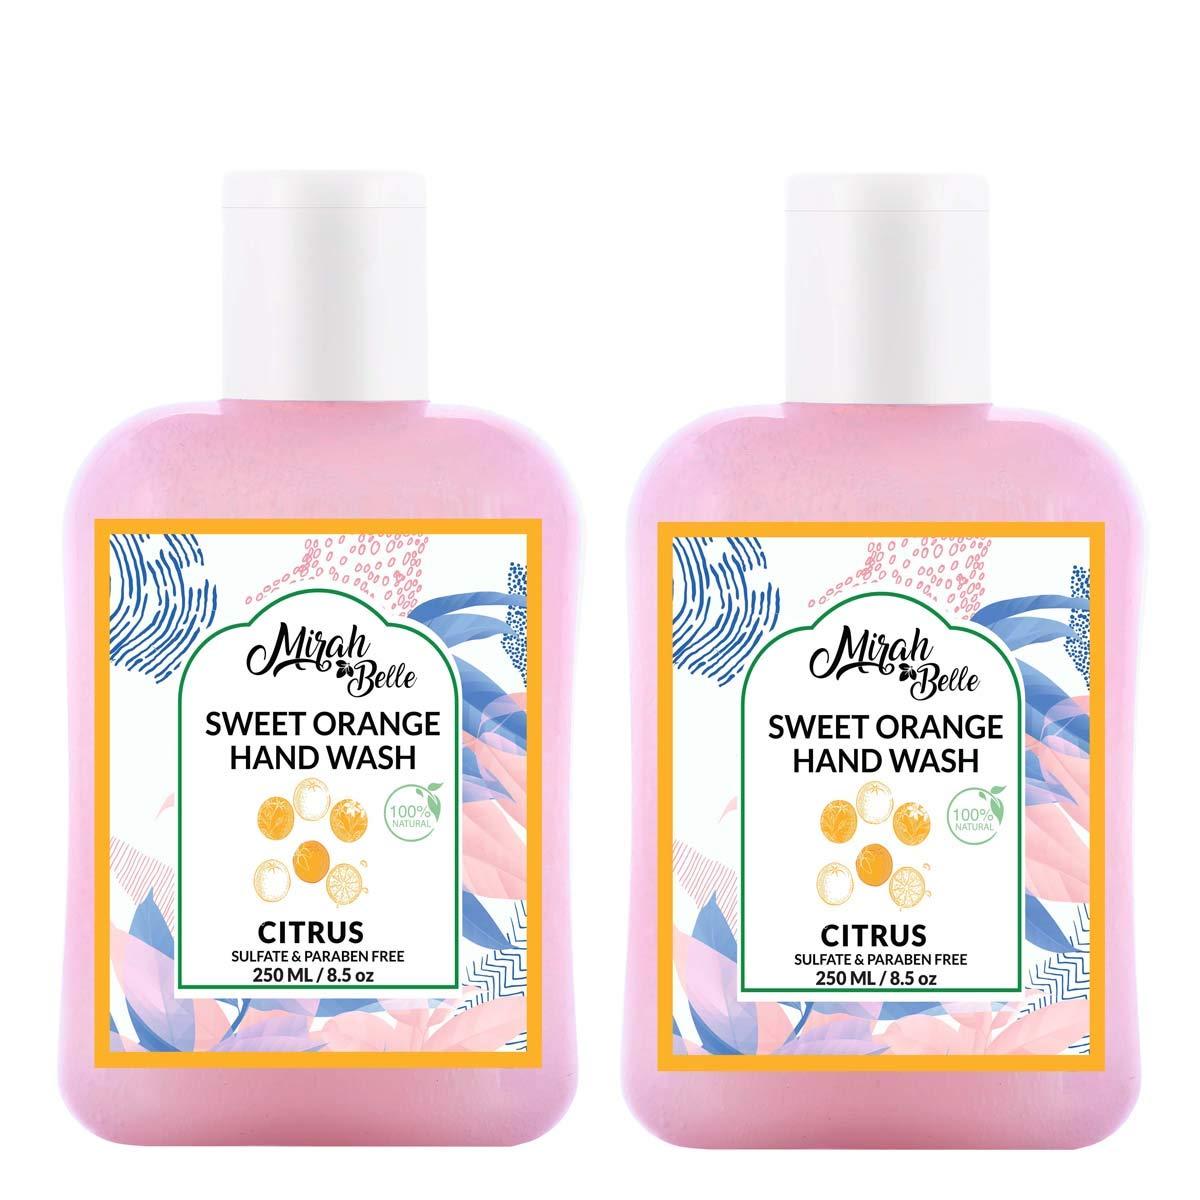 Mirah Belle – Sweet Orange Hand Wash (Pack of 2)